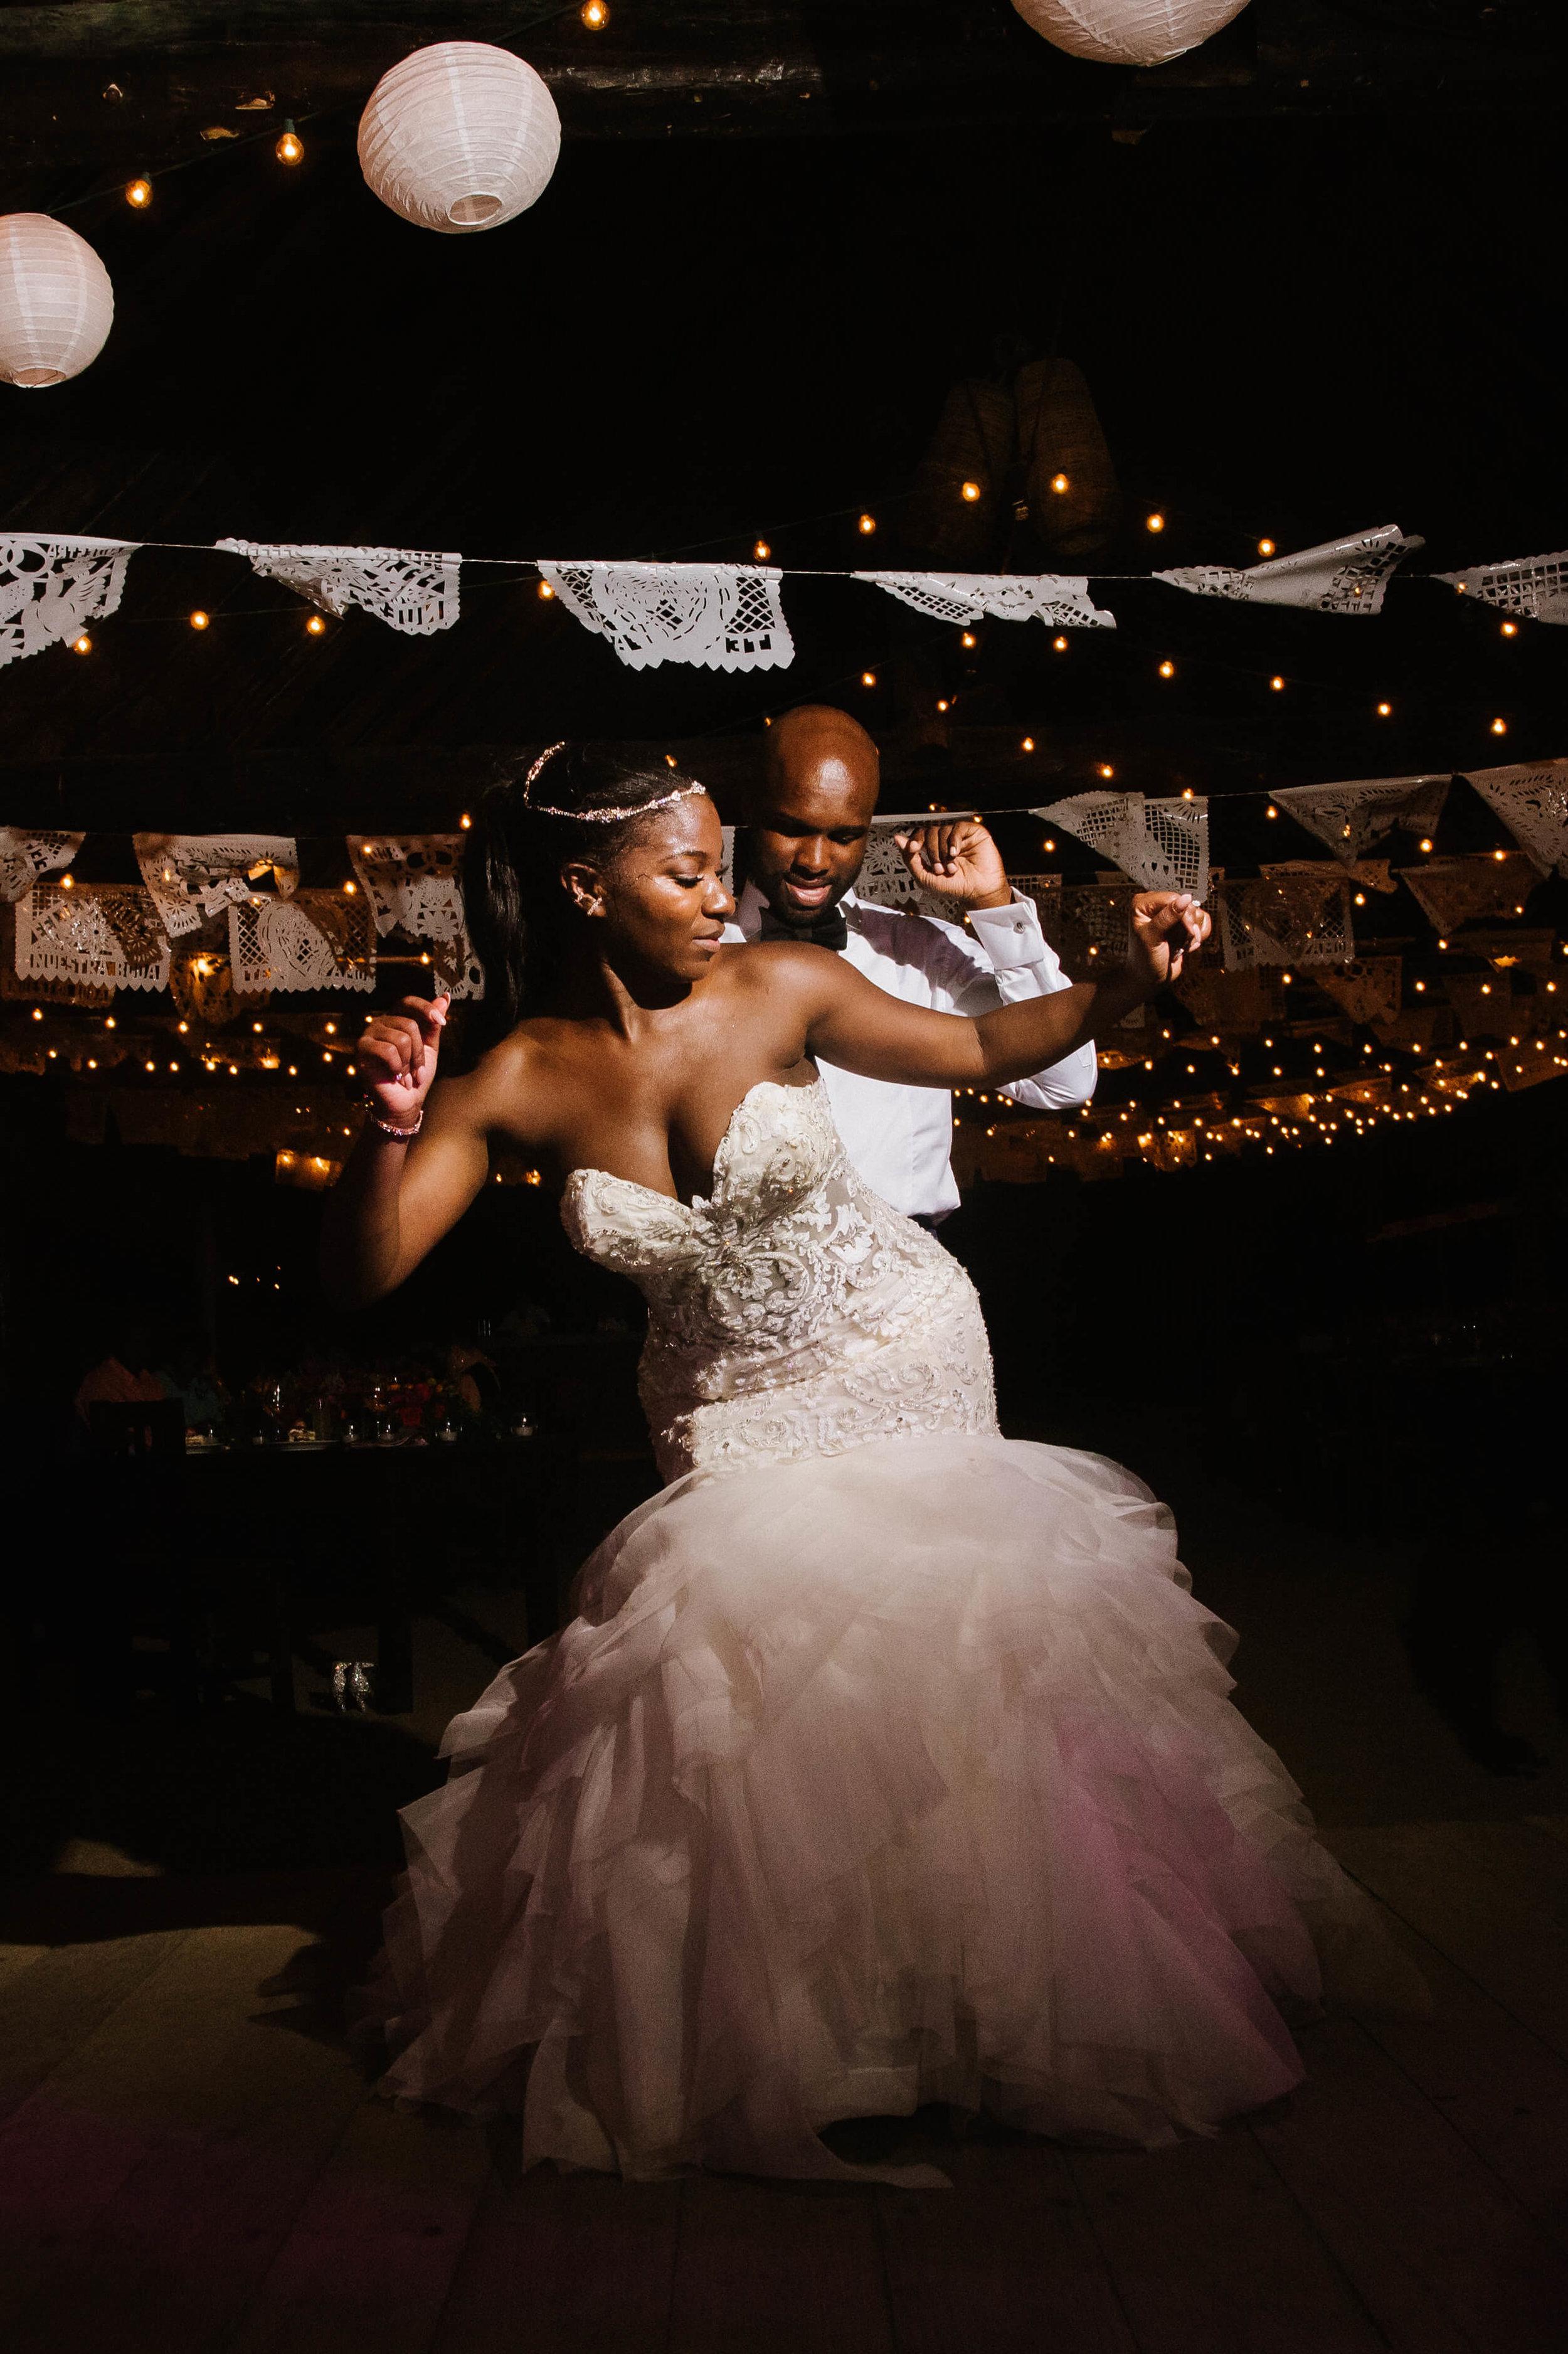 destiland-desti-sweating-for-the-destination-wedding-ready-workouts-2019-booty-2.jpg